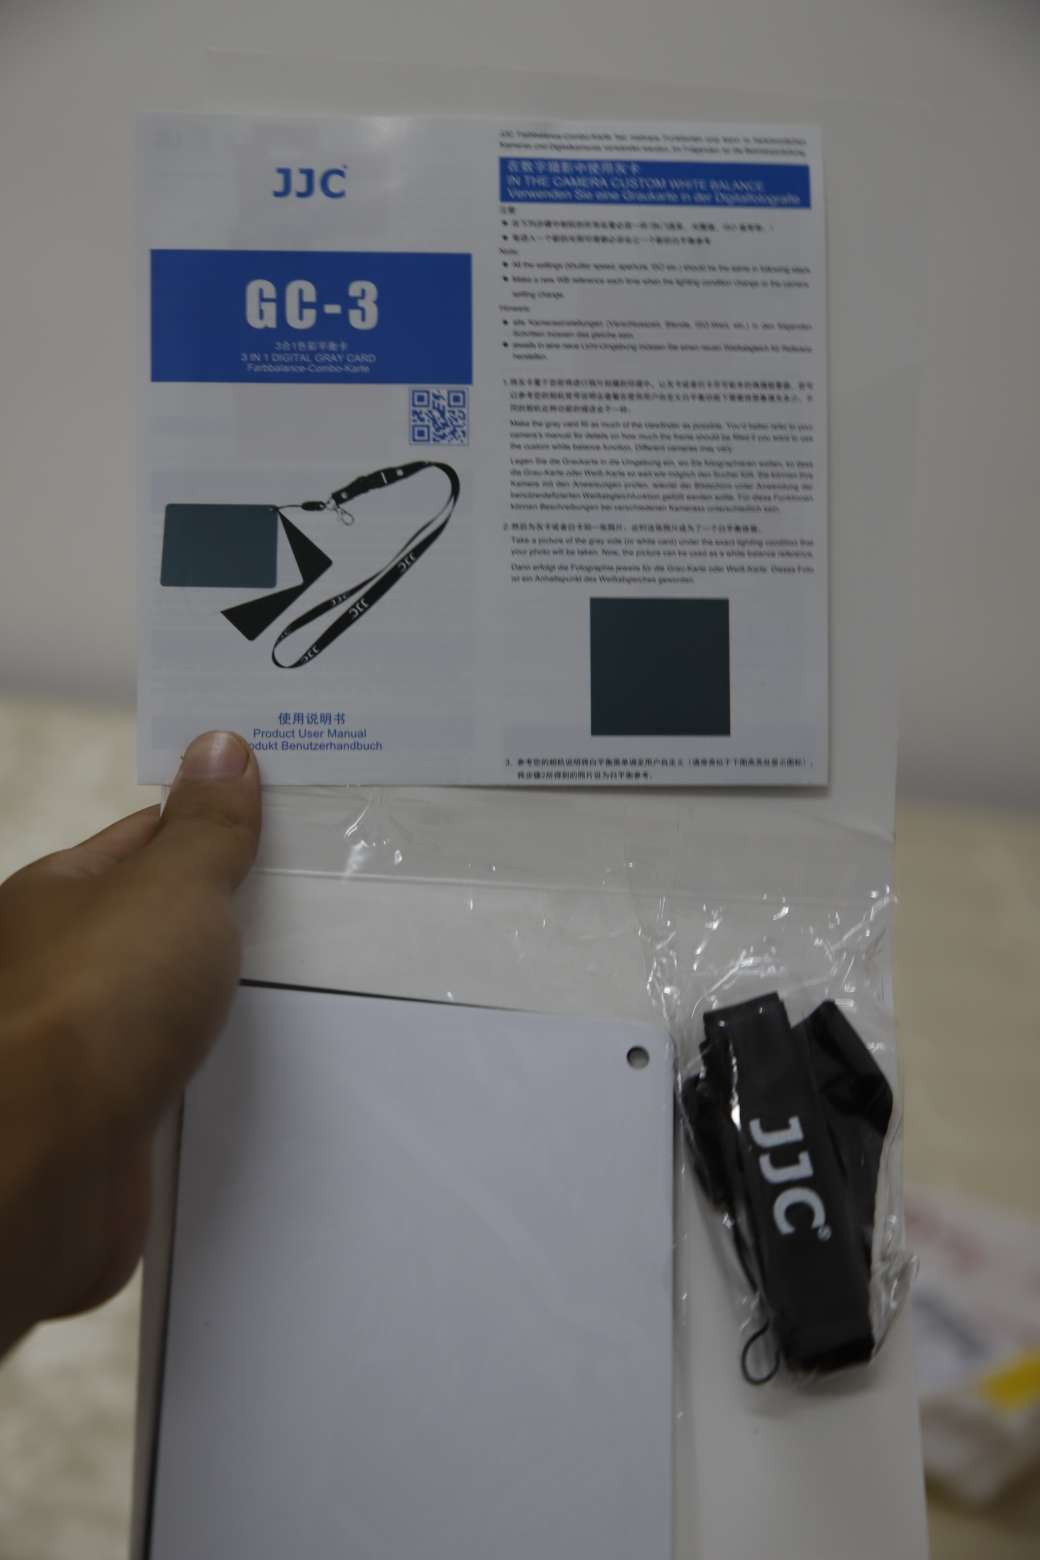 retro 6 infrared 2014 on feet 00973894 mall